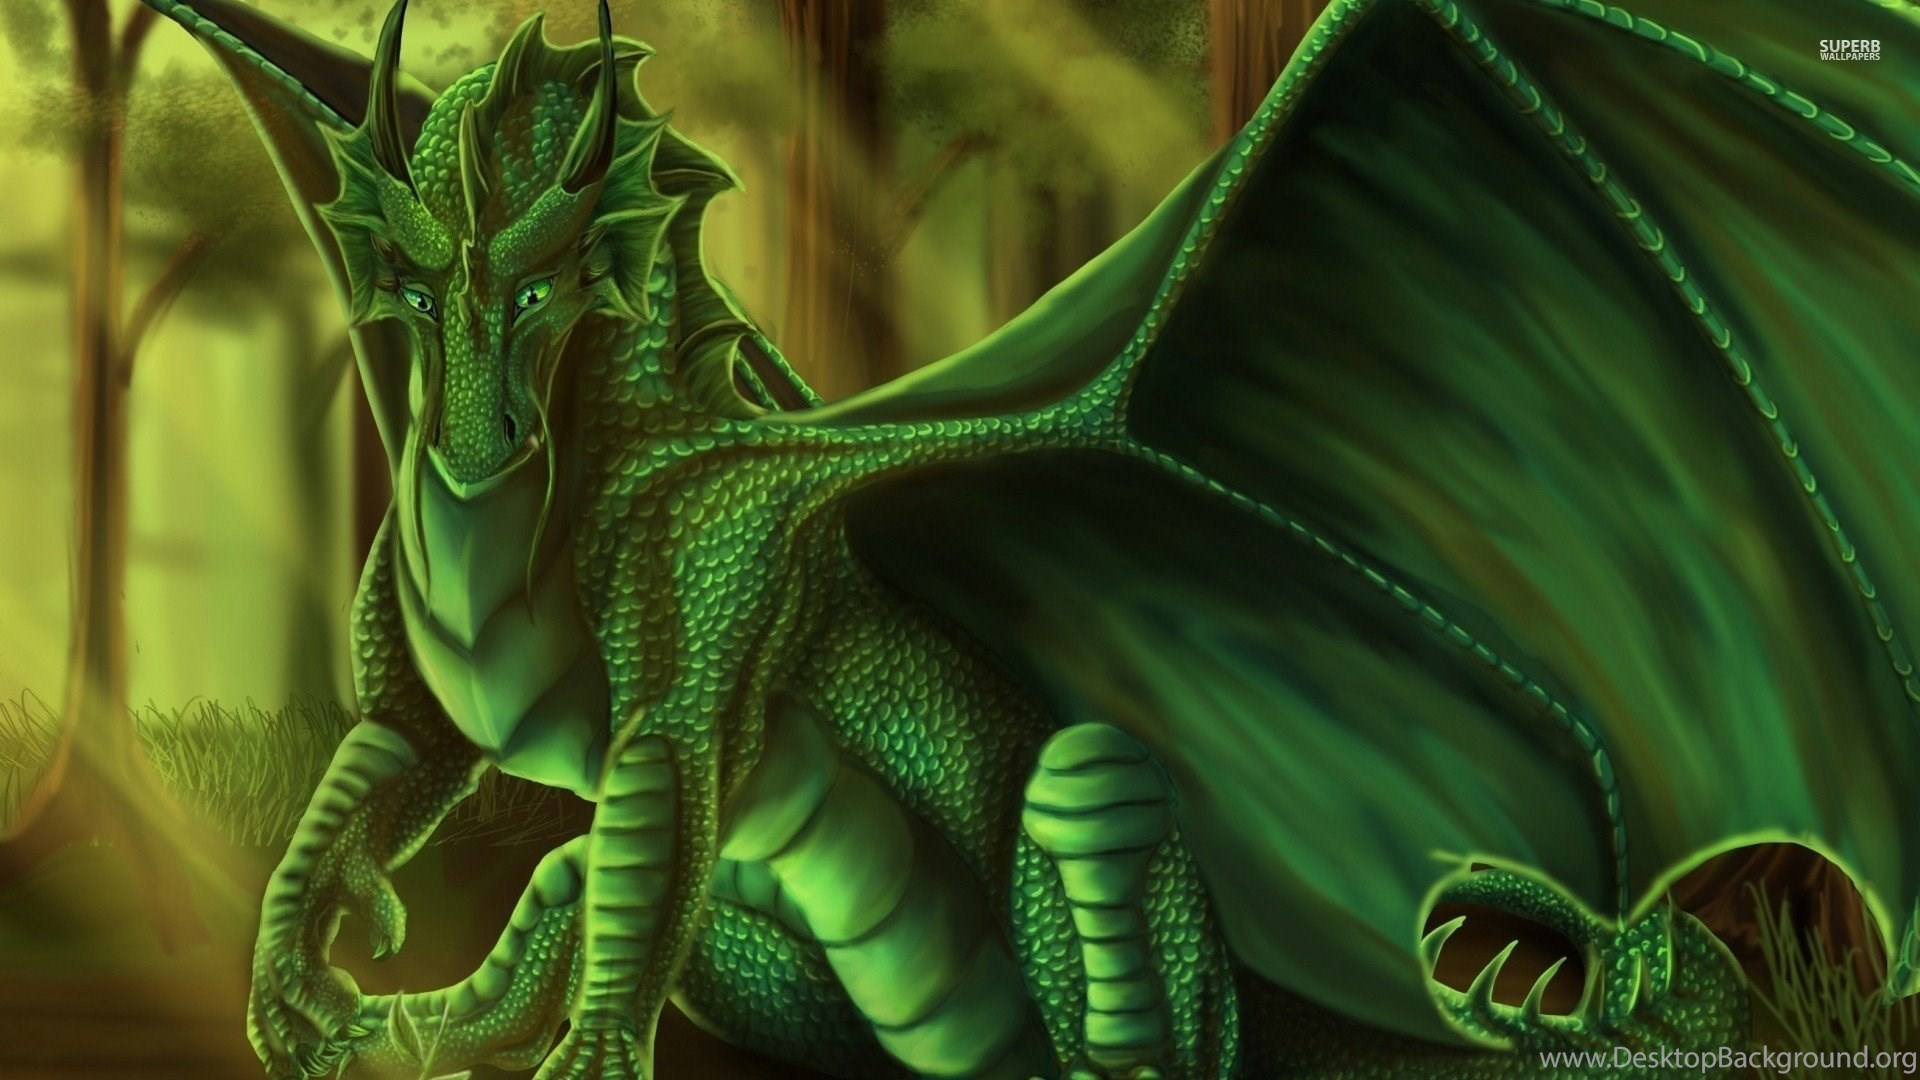 Green Dragon Wallpapers Fantasy Wallpapers Desktop Background